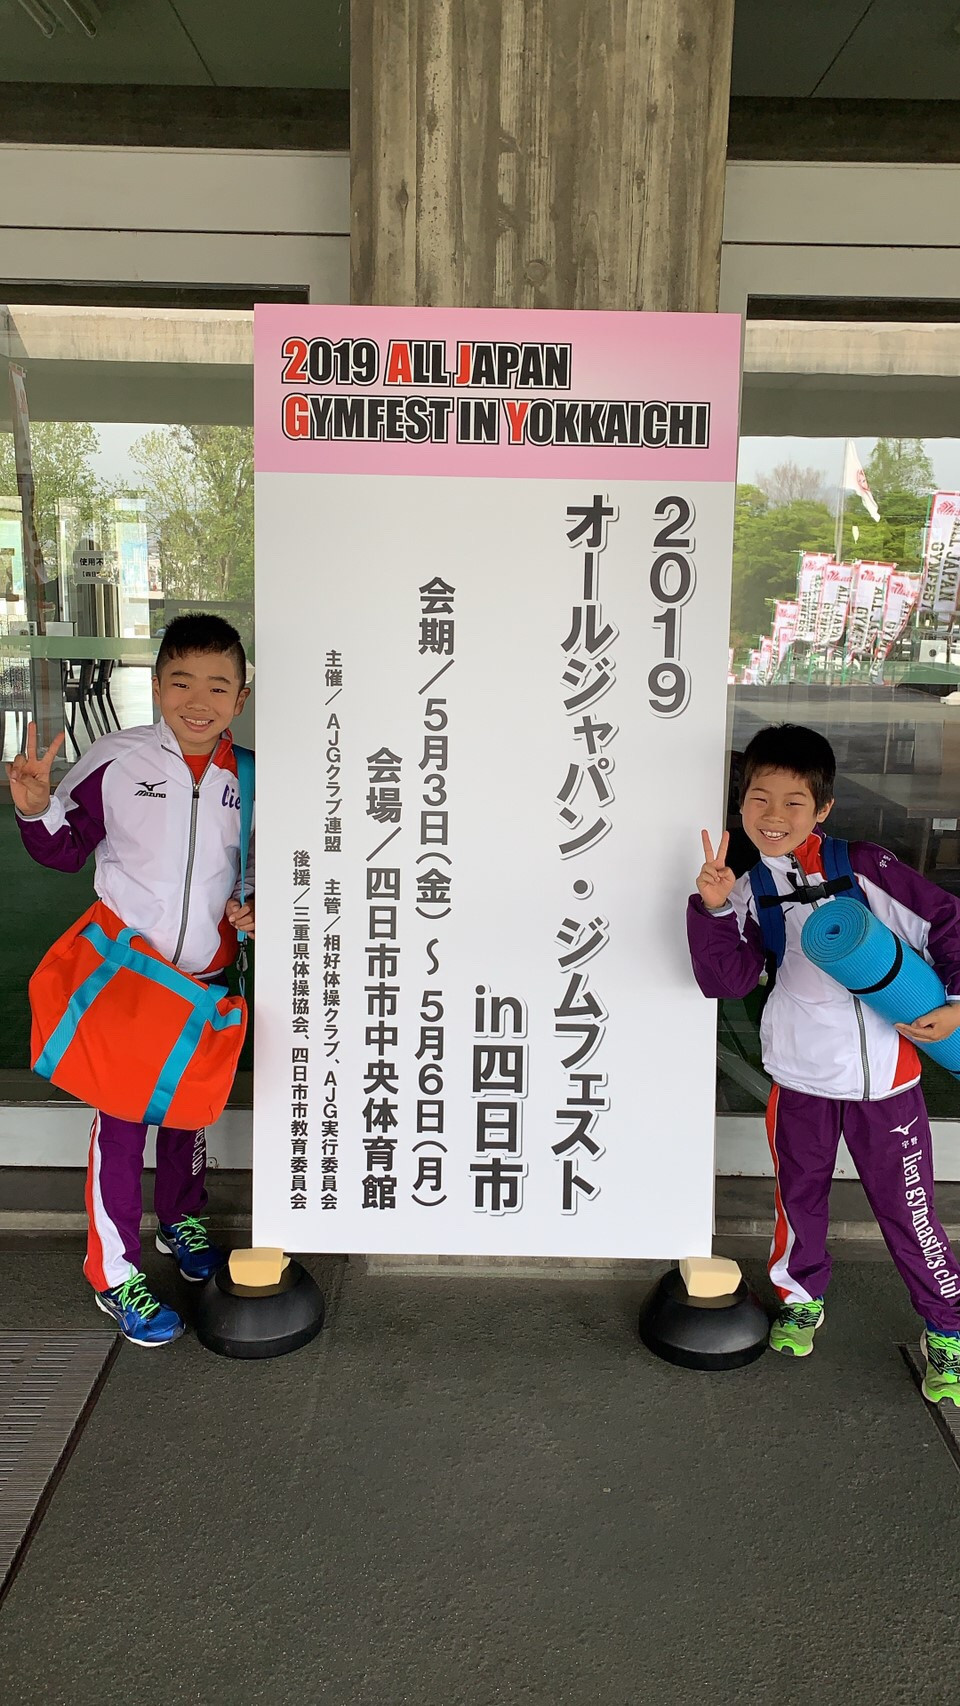 2019年AJG大会in三重県画像9